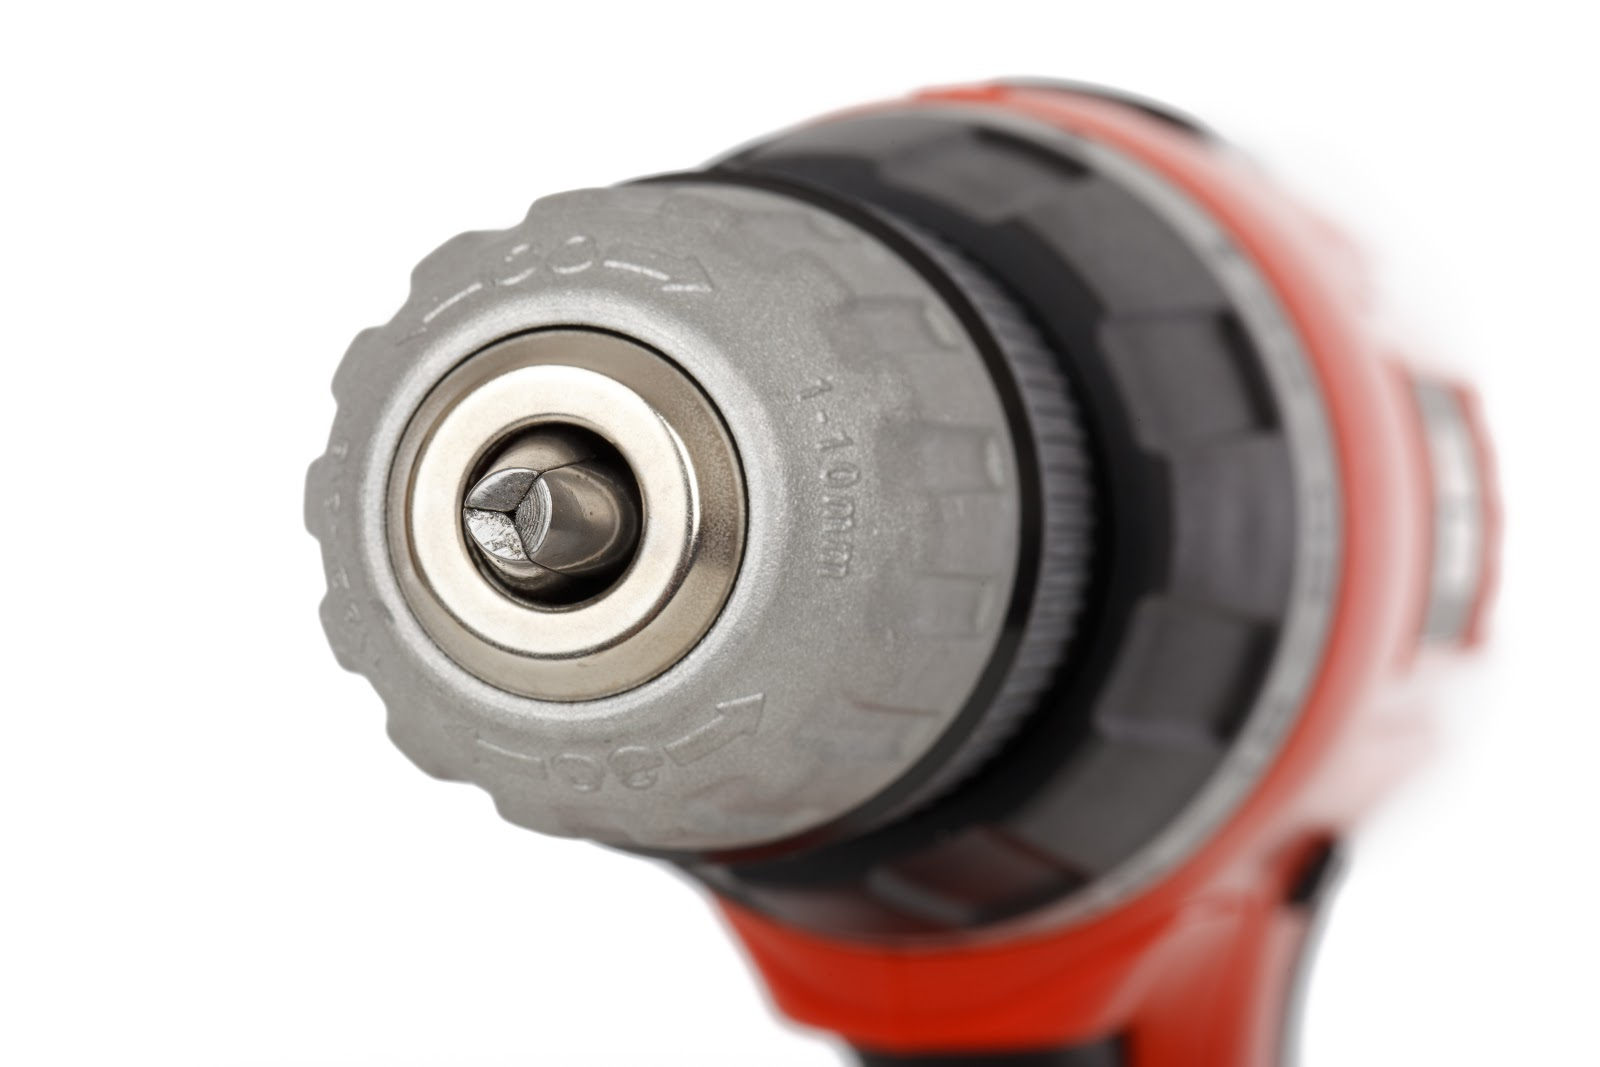 head-construction-cordless-drill-41209.jpeg